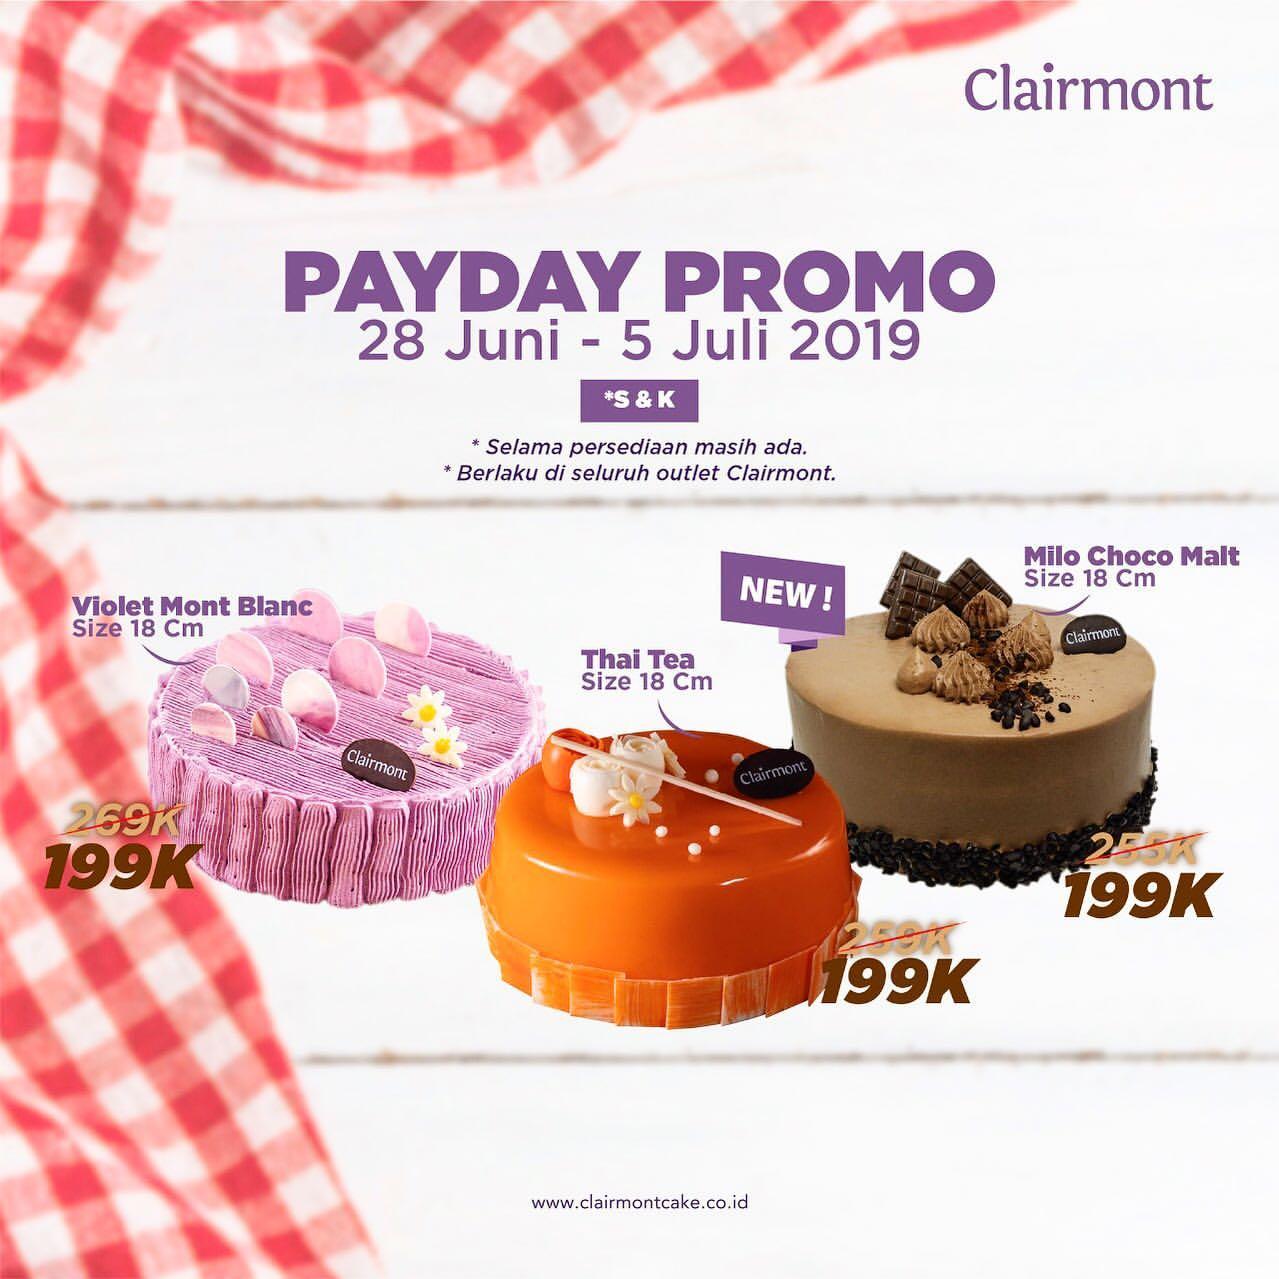 Clairmont Cake Payday Promo, Harga Spesial Cuma Rp. 199.000!